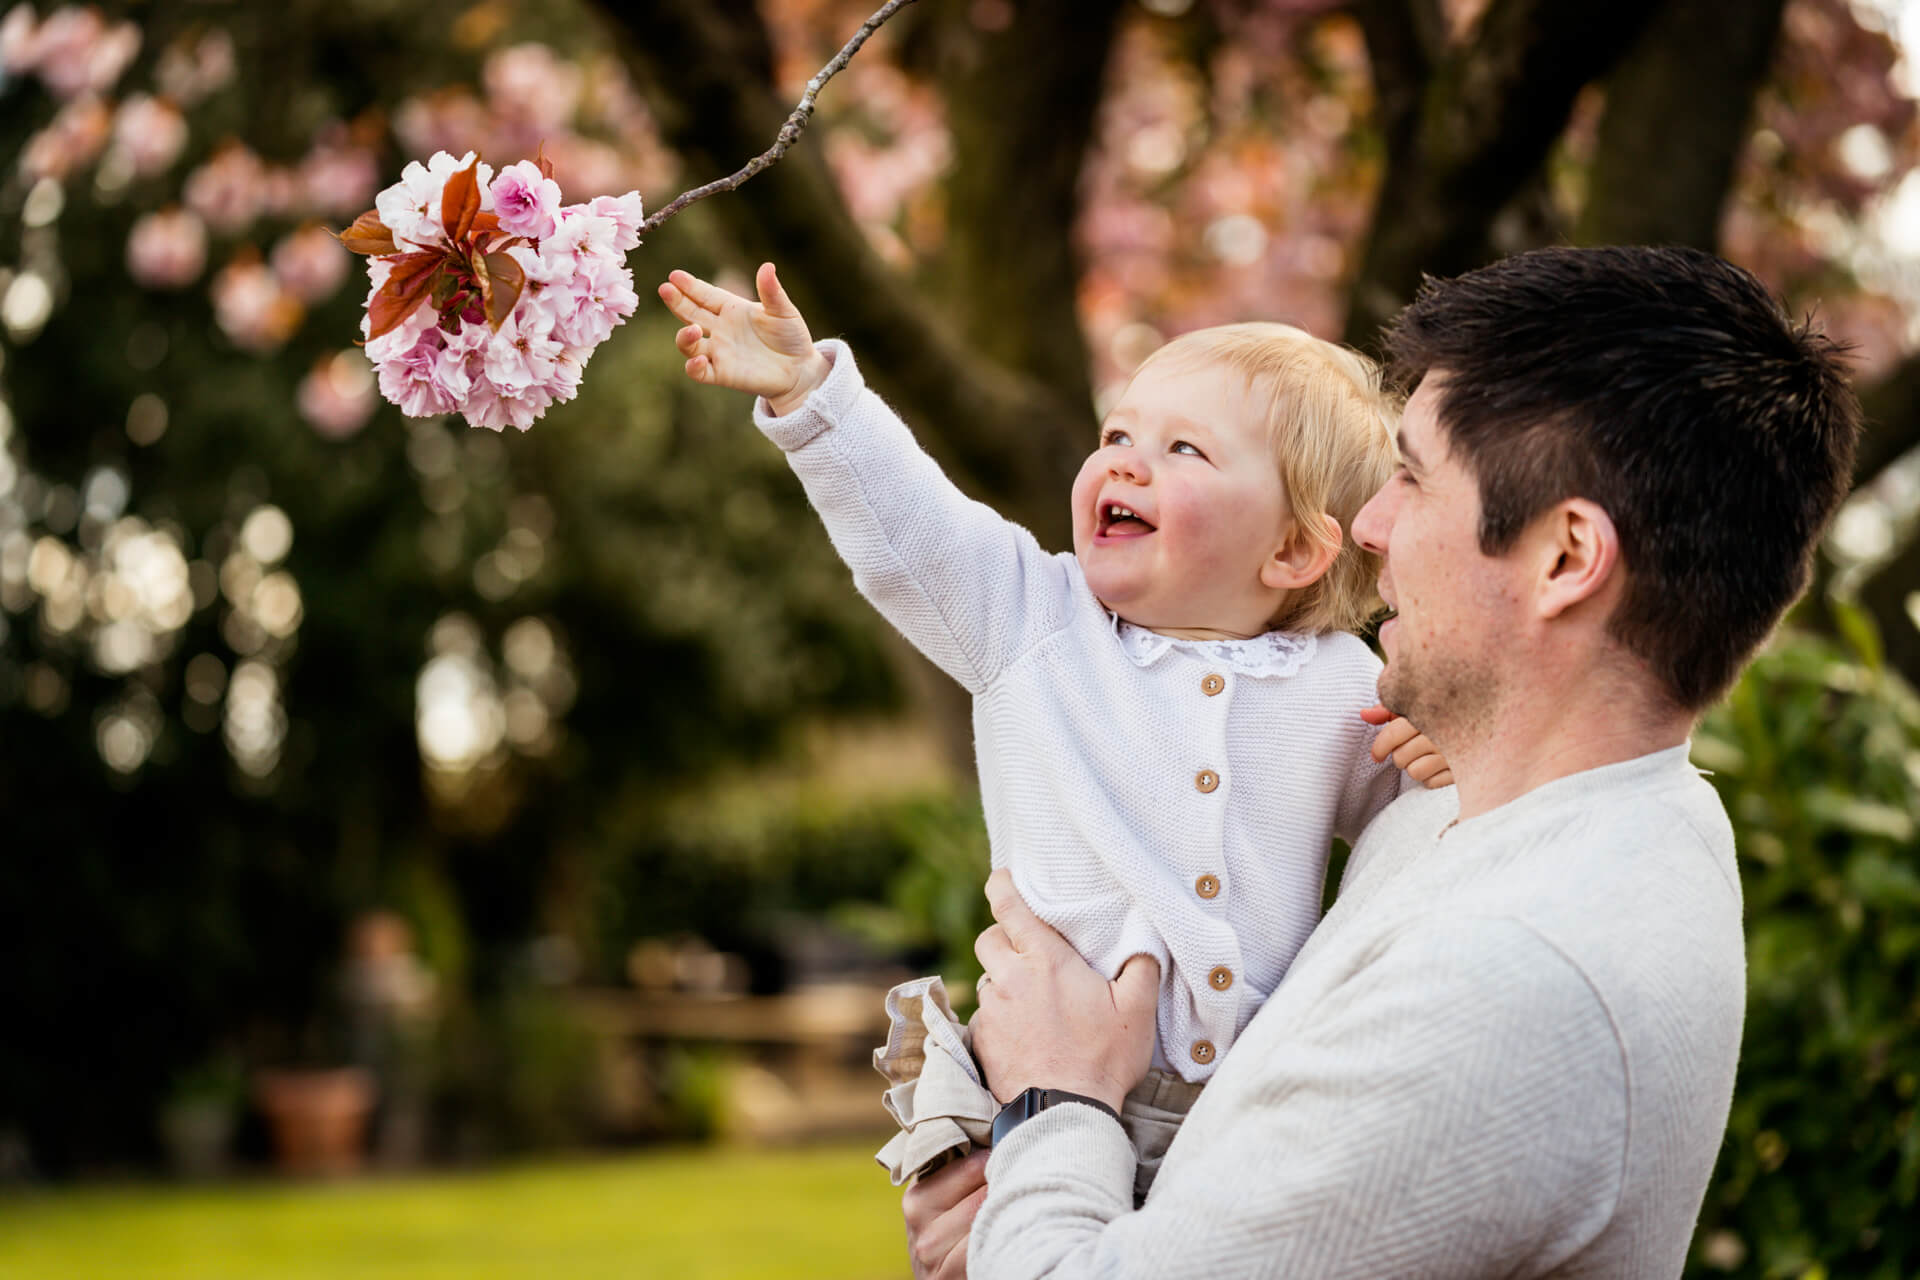 harrogate family photography- little girl reaching for a blossom